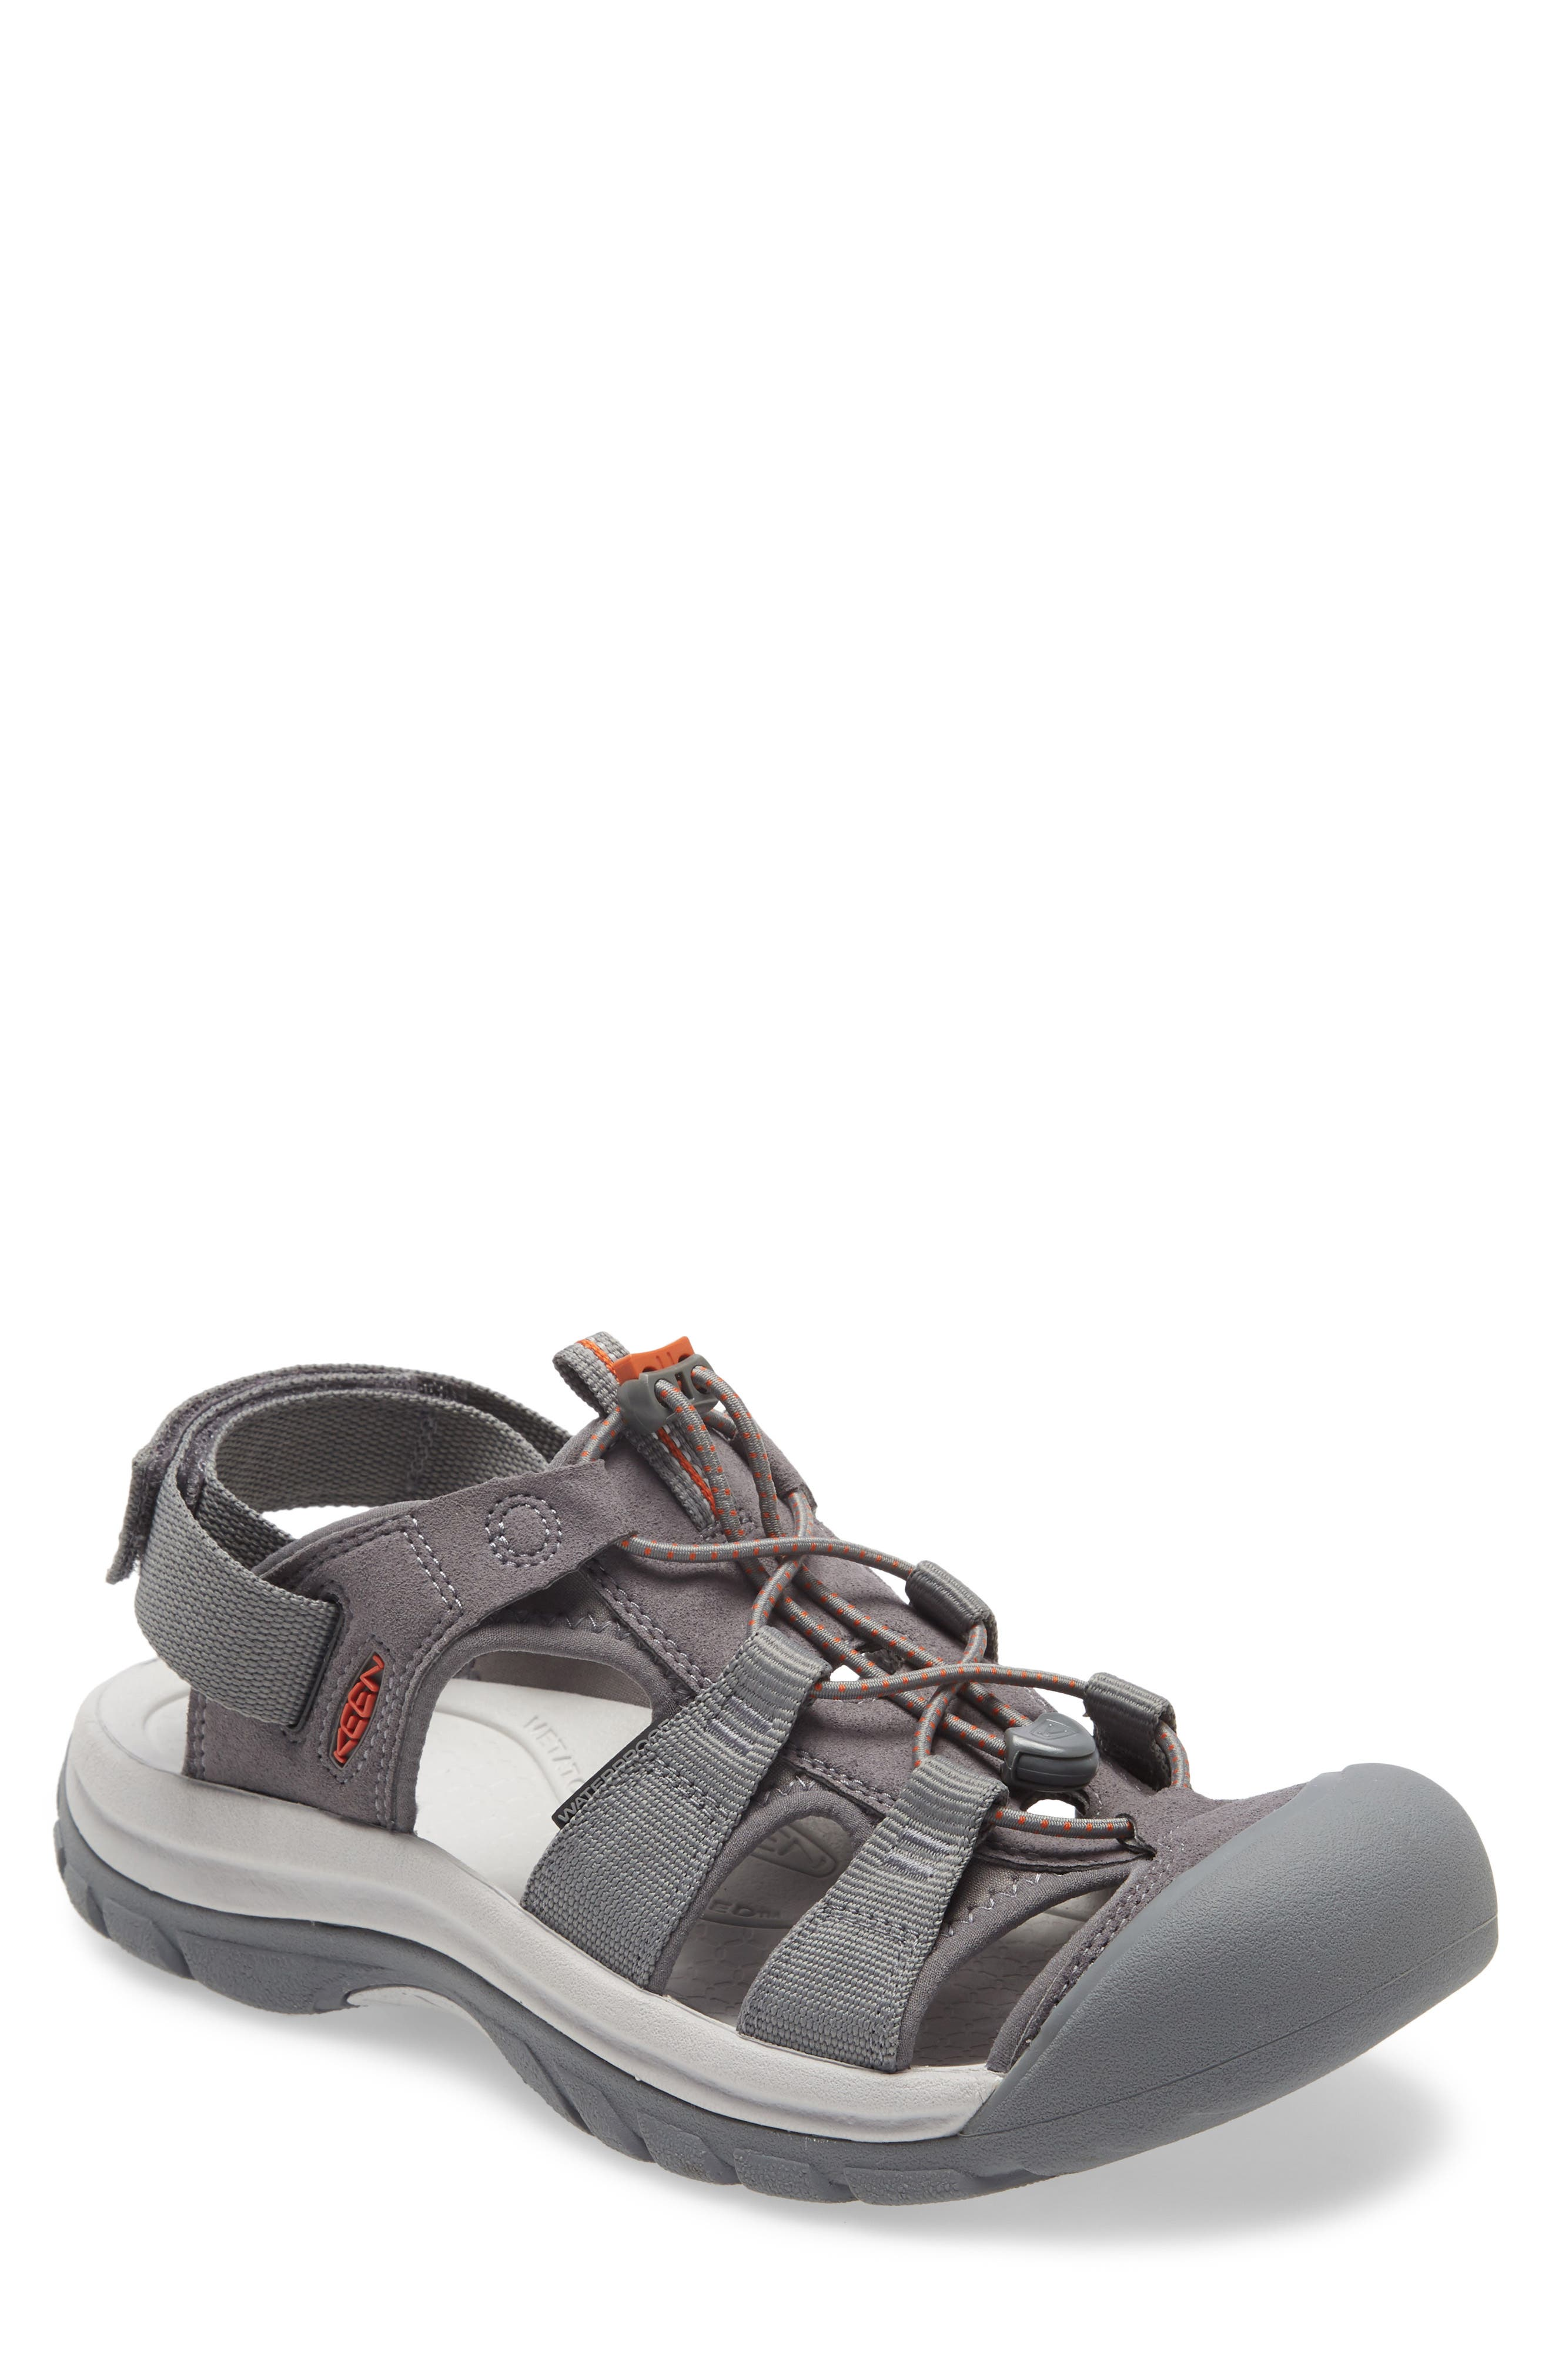 Rapids H2 Sandal